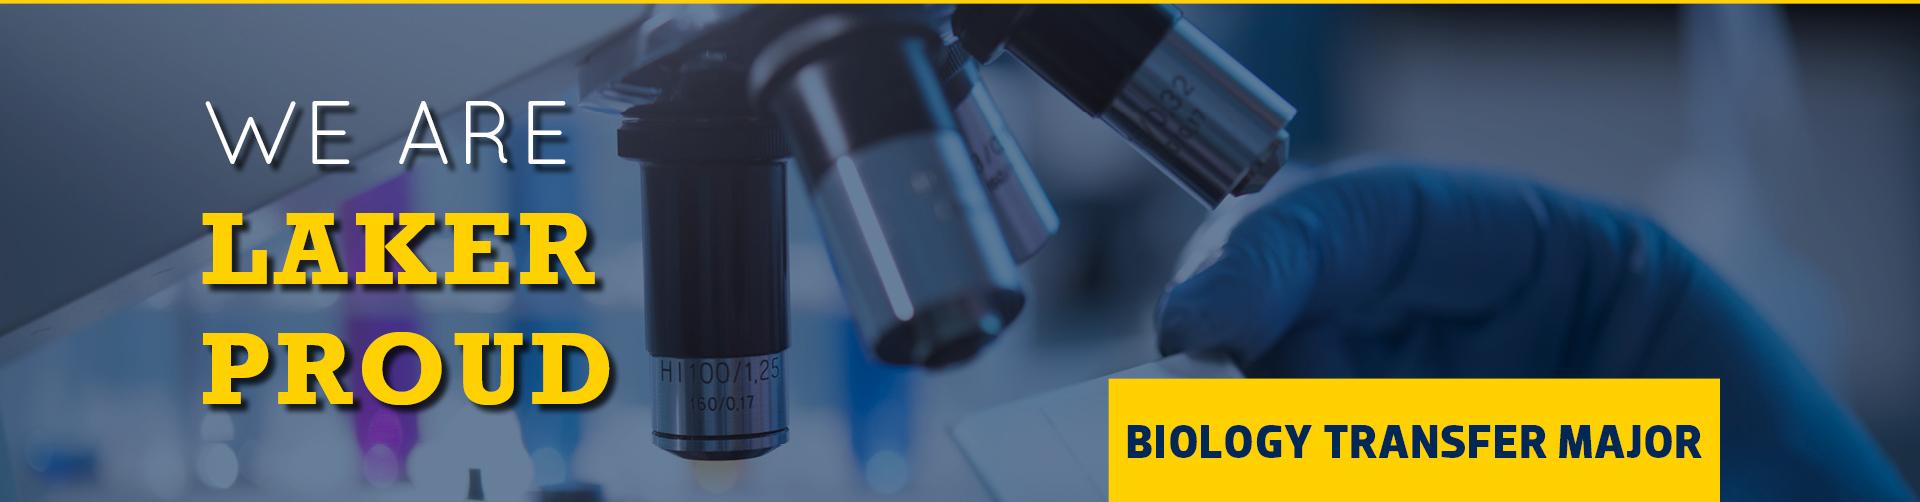 Biology Transfer Major